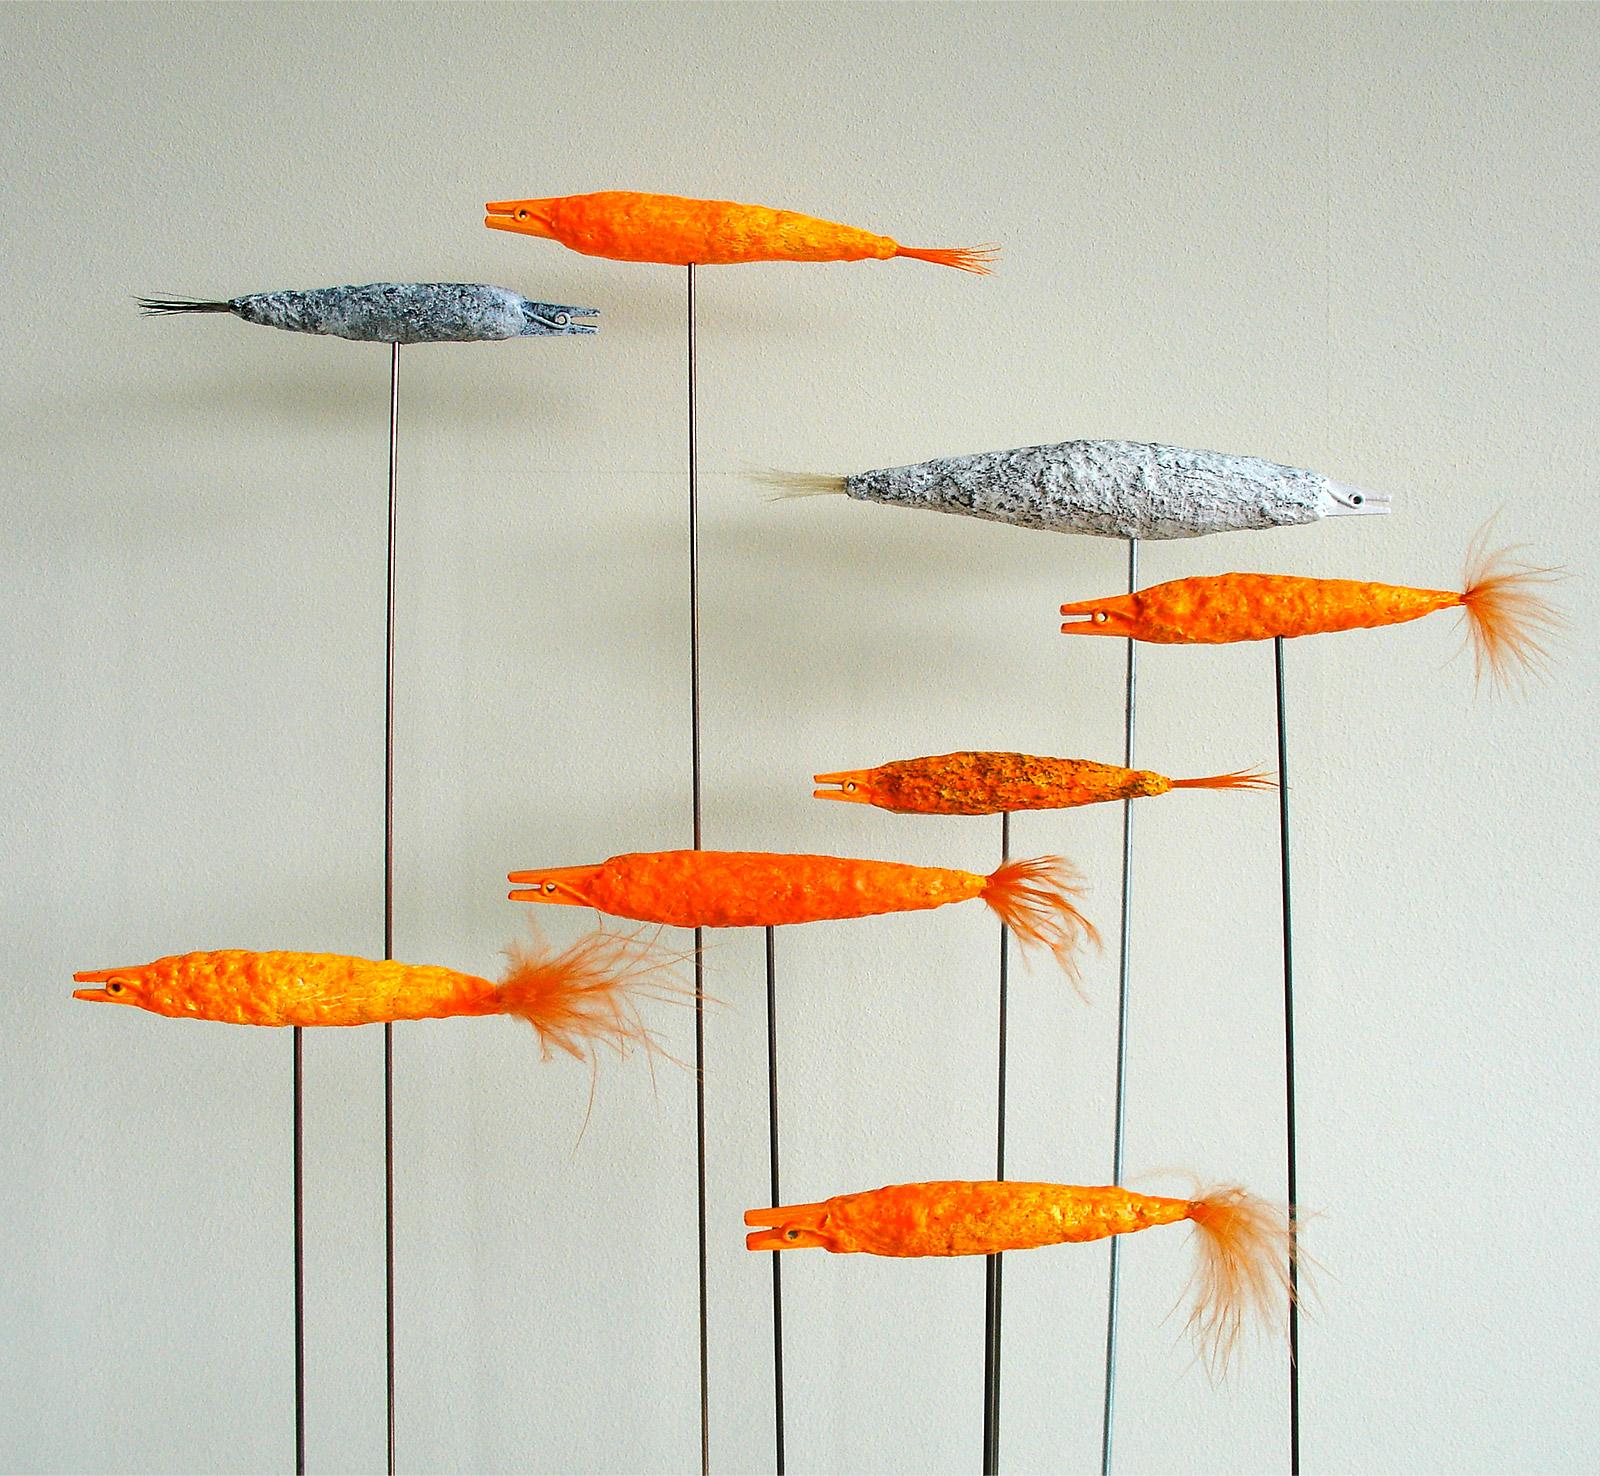 Tanja Blokland: Vissen